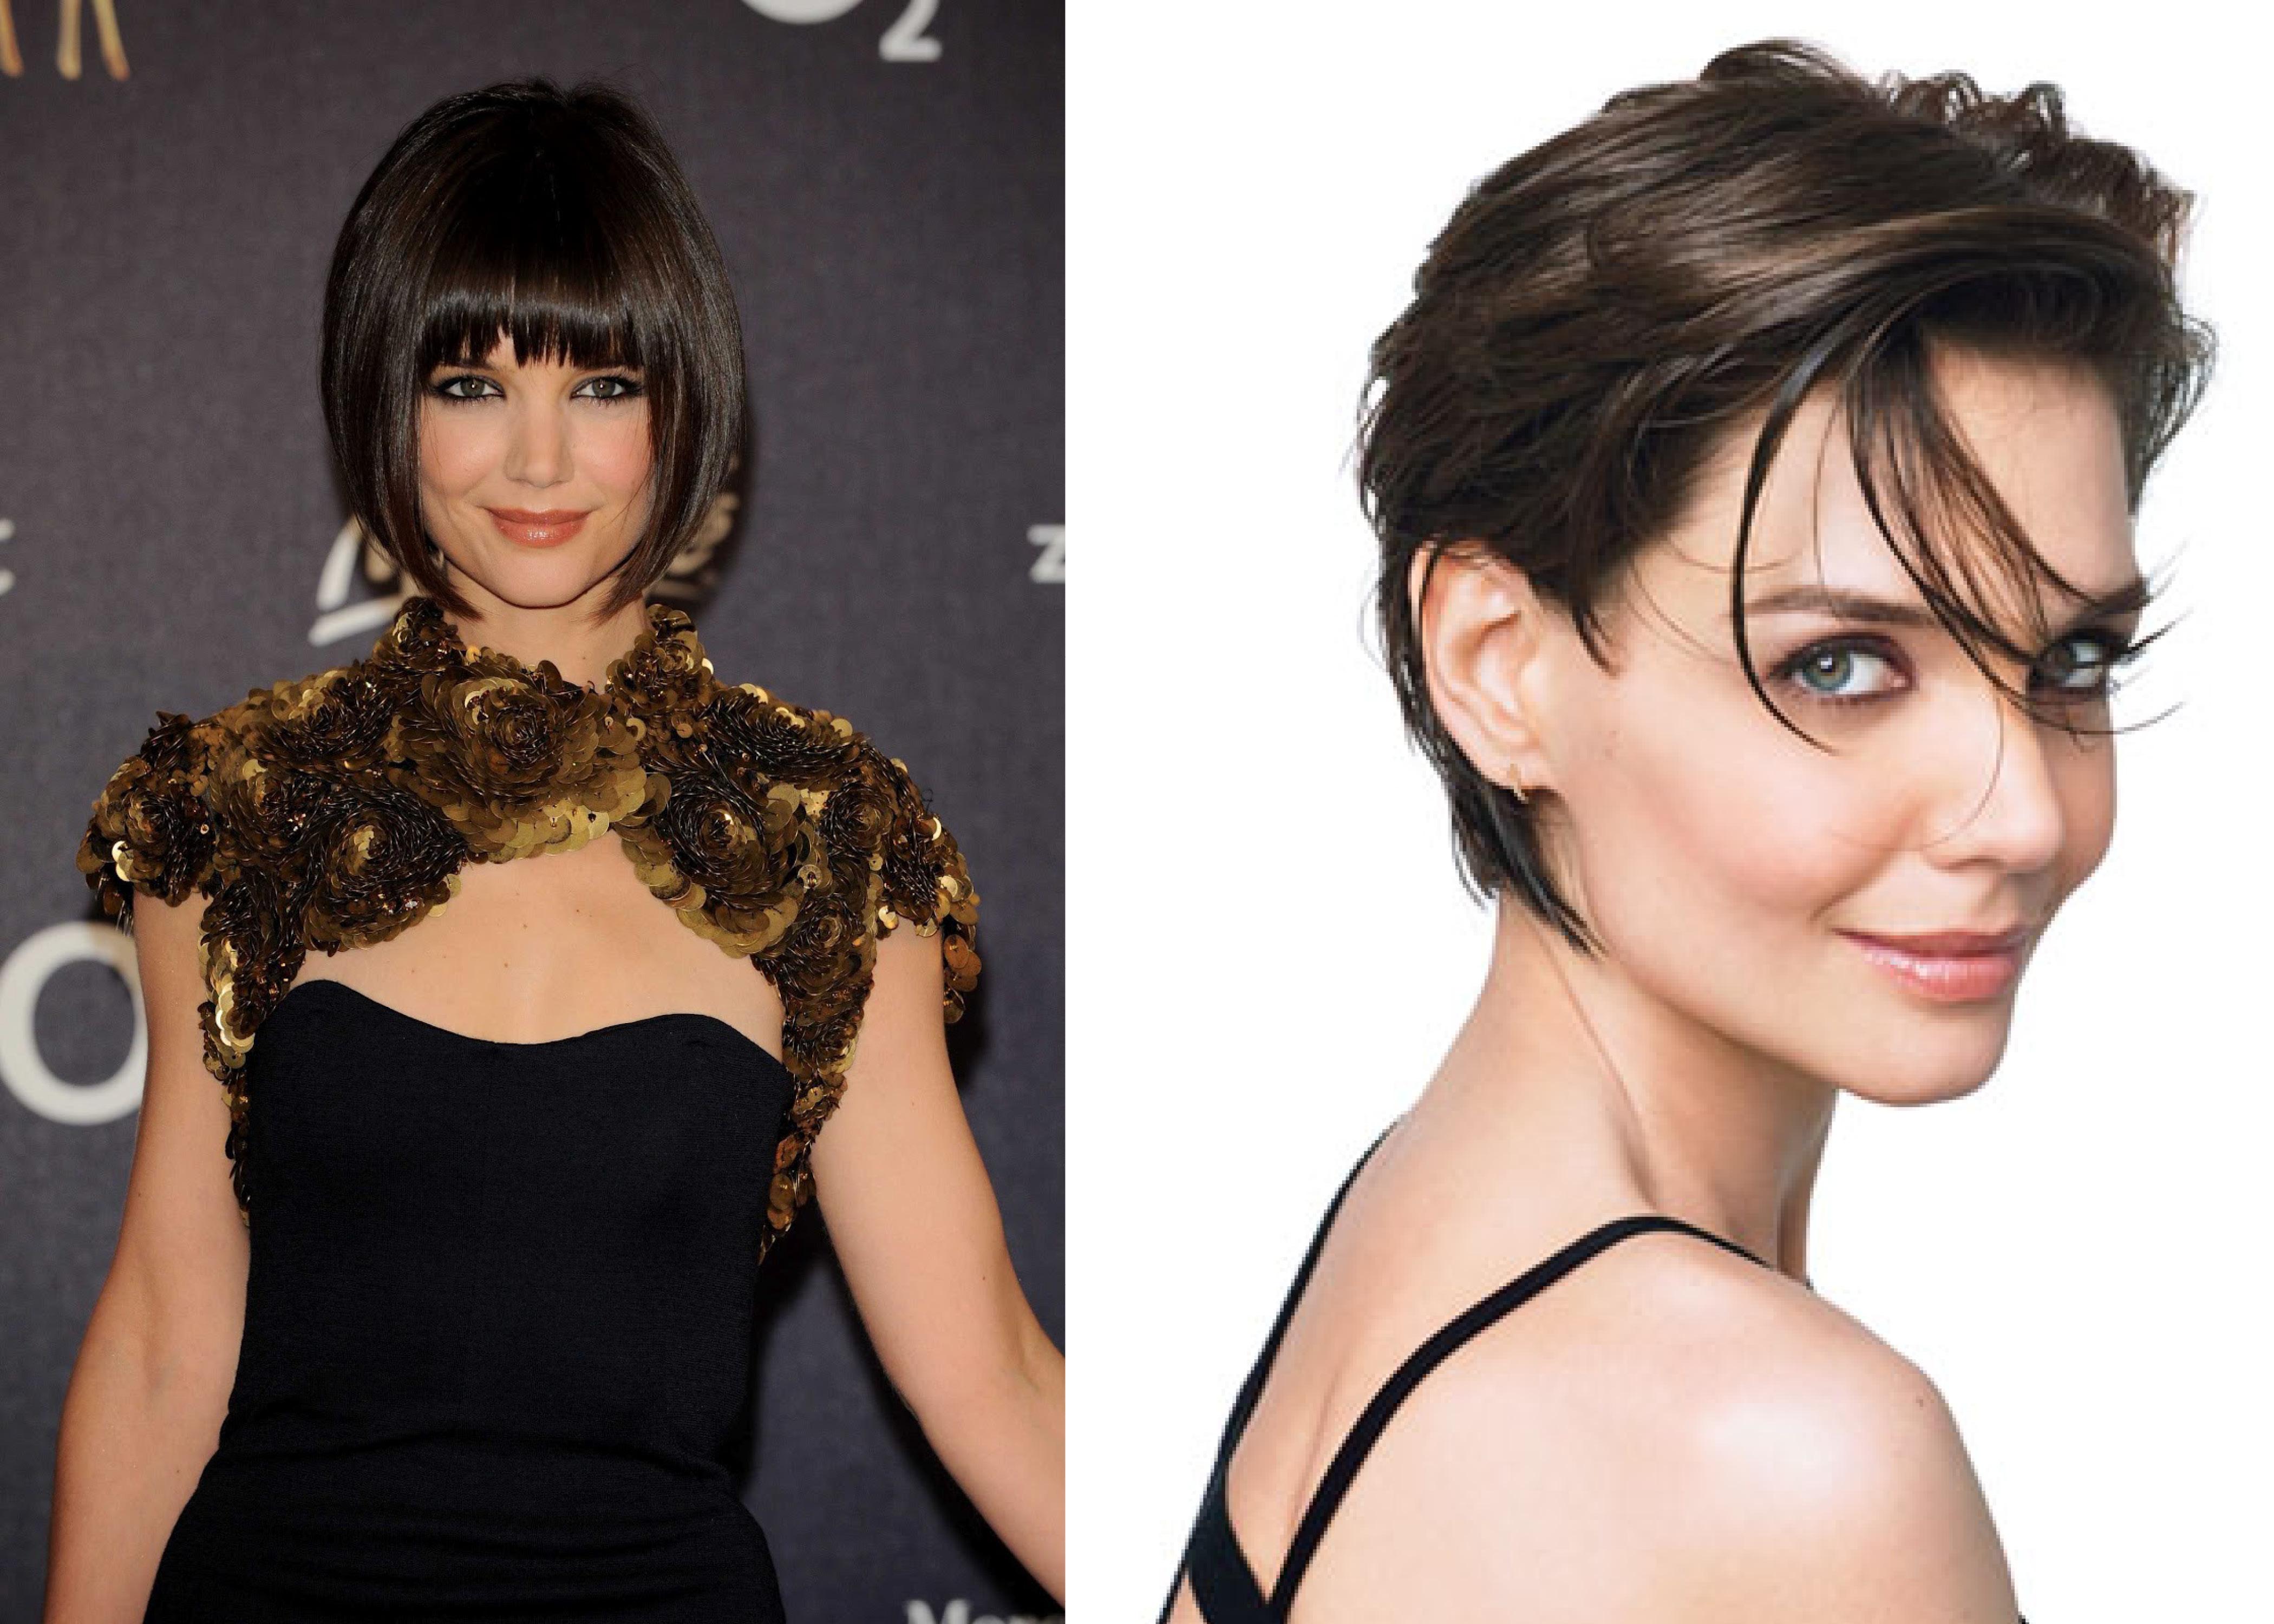 Fantastic Dear Katie Holmes Avanti Salon39S Hair And Beauty Blog Short Hairstyles Gunalazisus